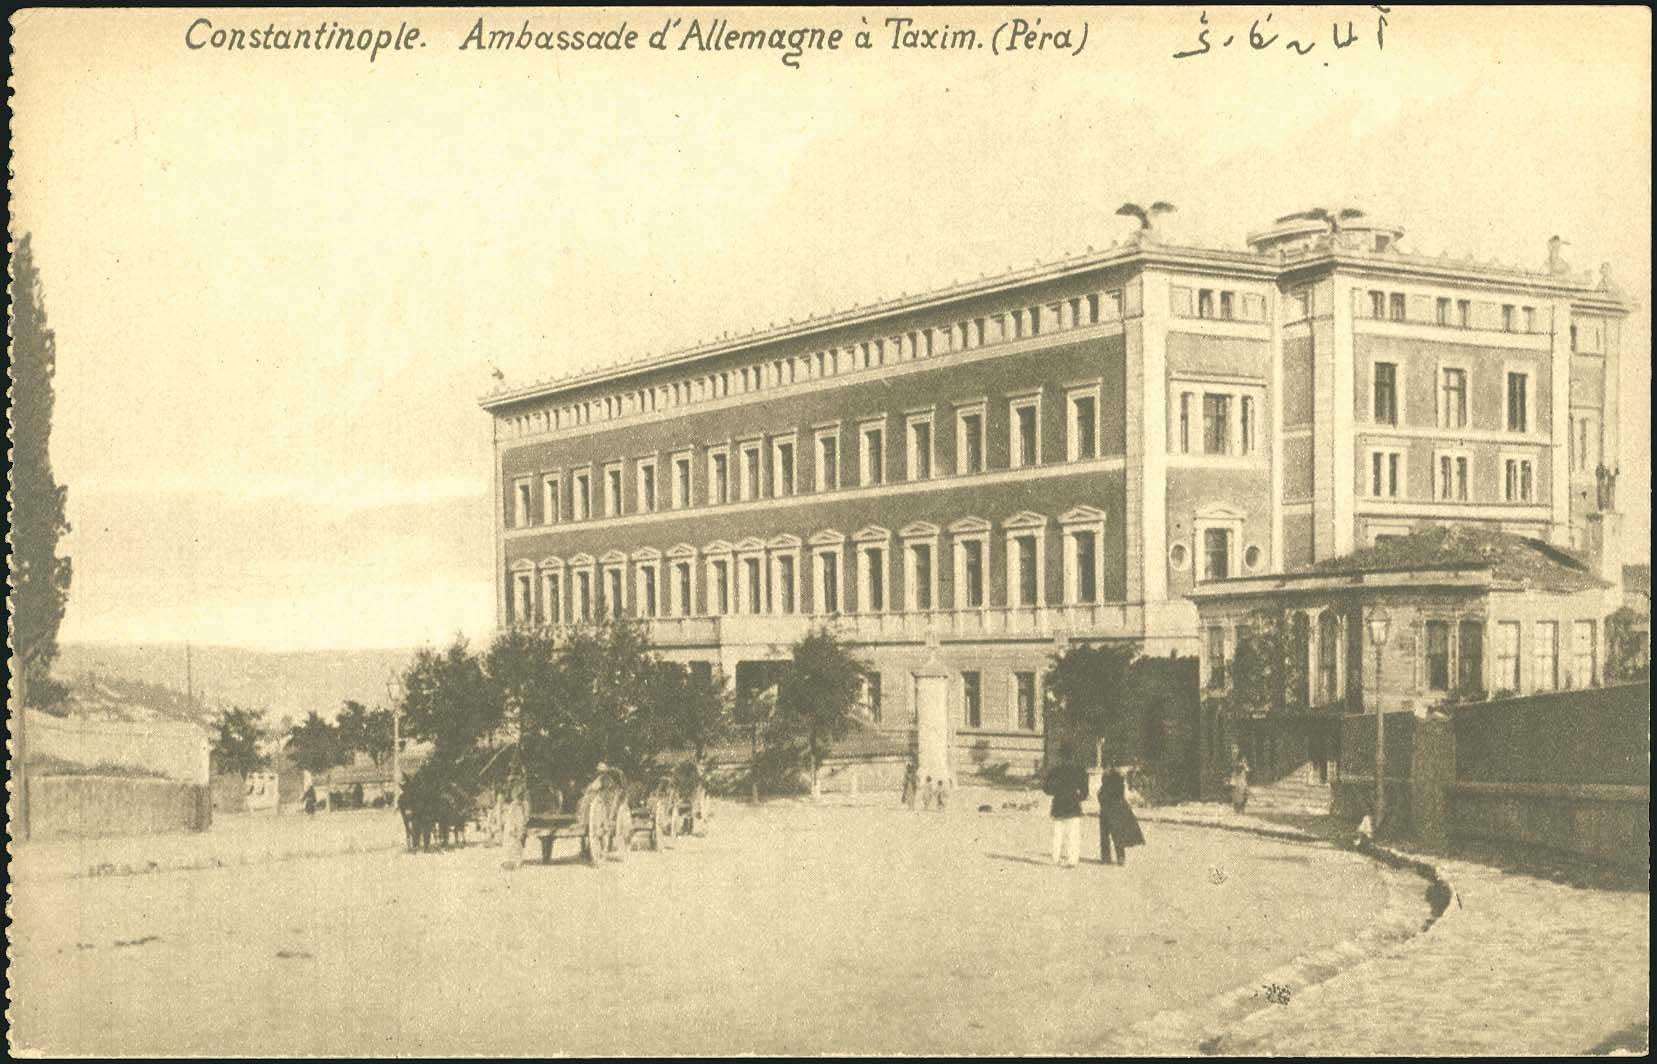 Lot 1815 - -  PICTURE POSTCARDS SMYRNE, CONSTANTINOPLE, ASIA MINOR -  A. Karamitsos Postal & Live Internet Auction 677